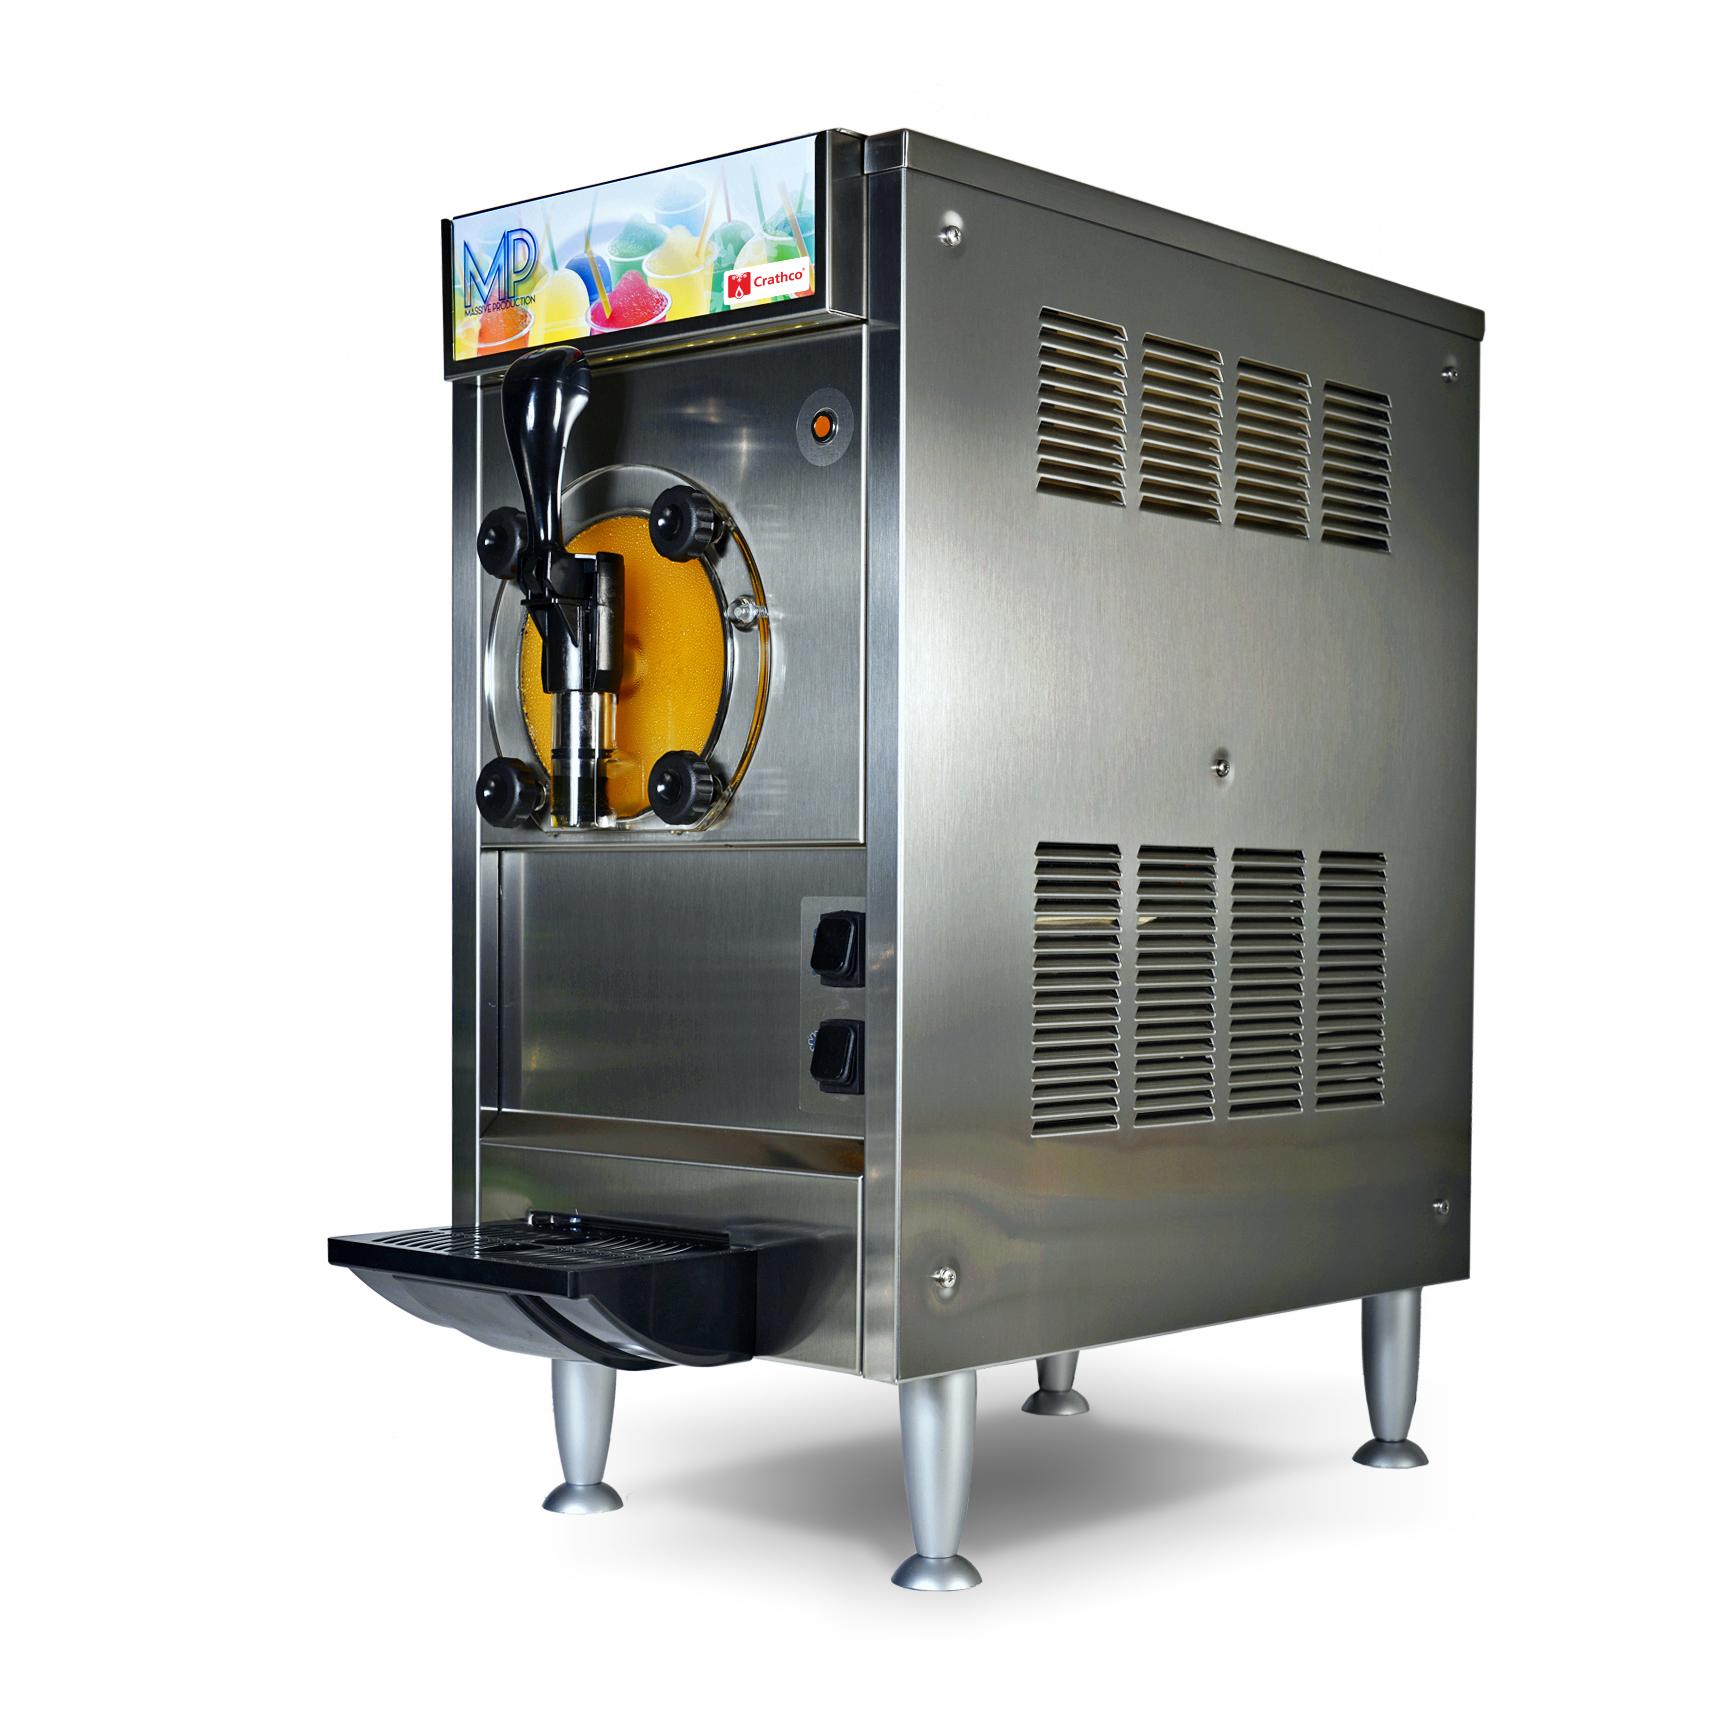 Grindmaster-Cecilware MP frozen drink machine, non-carbonated, cylinder type